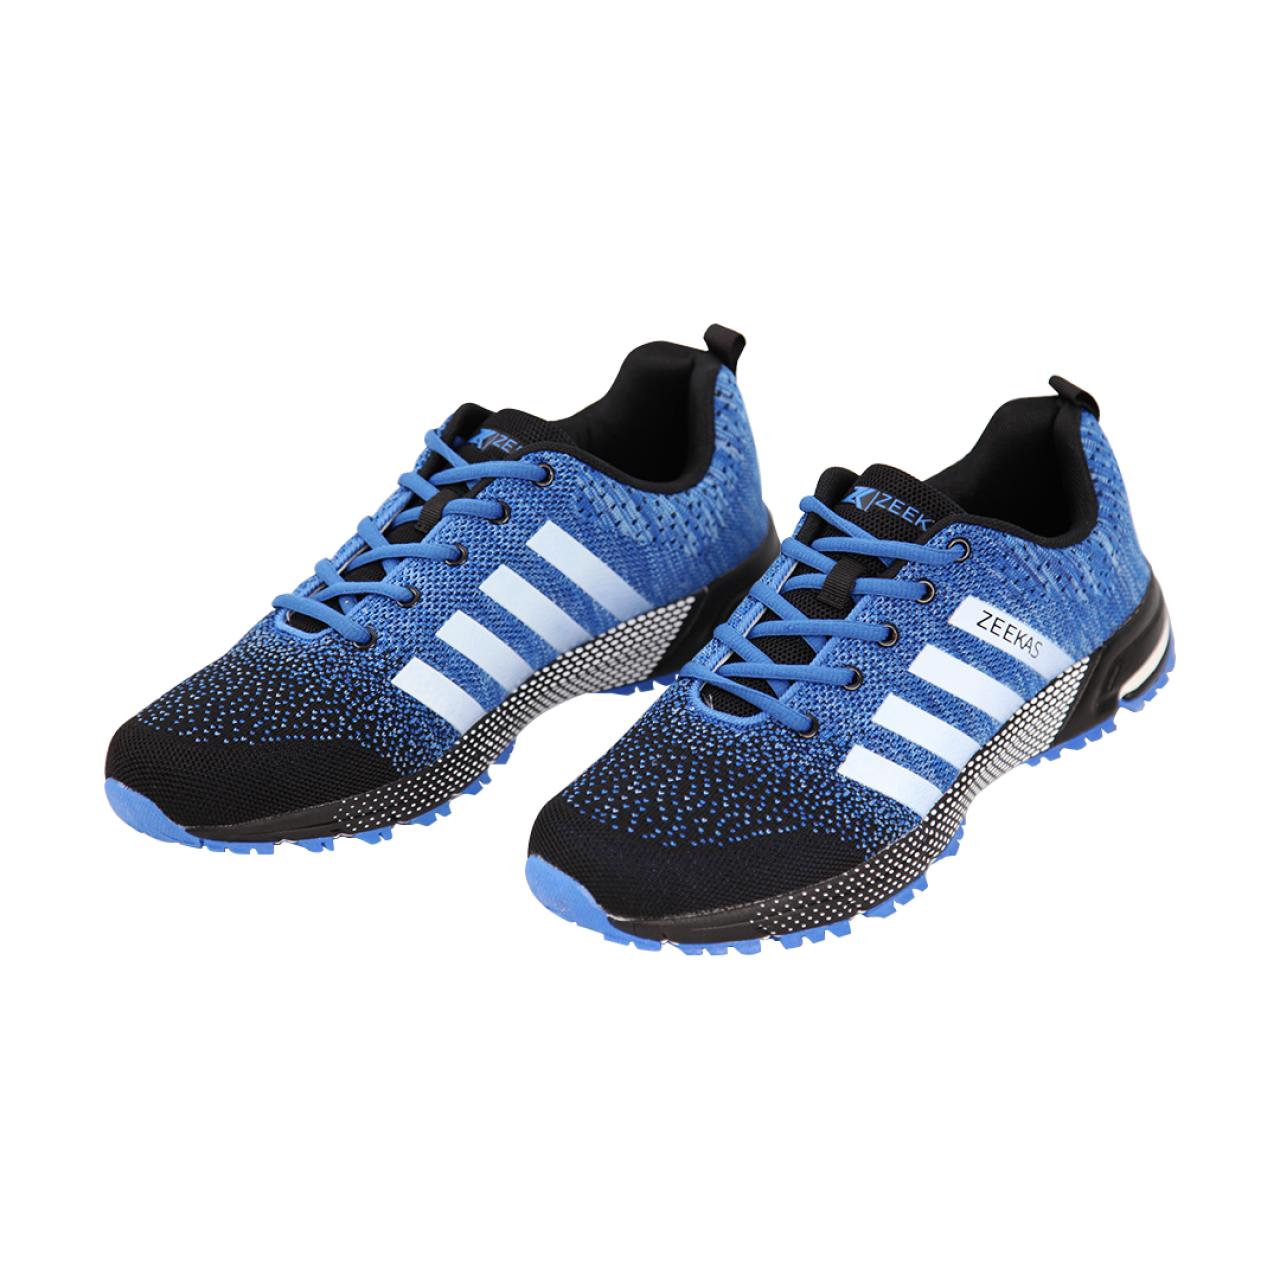 Zeekas Men Lace Up Sports Running Shoes - Blue